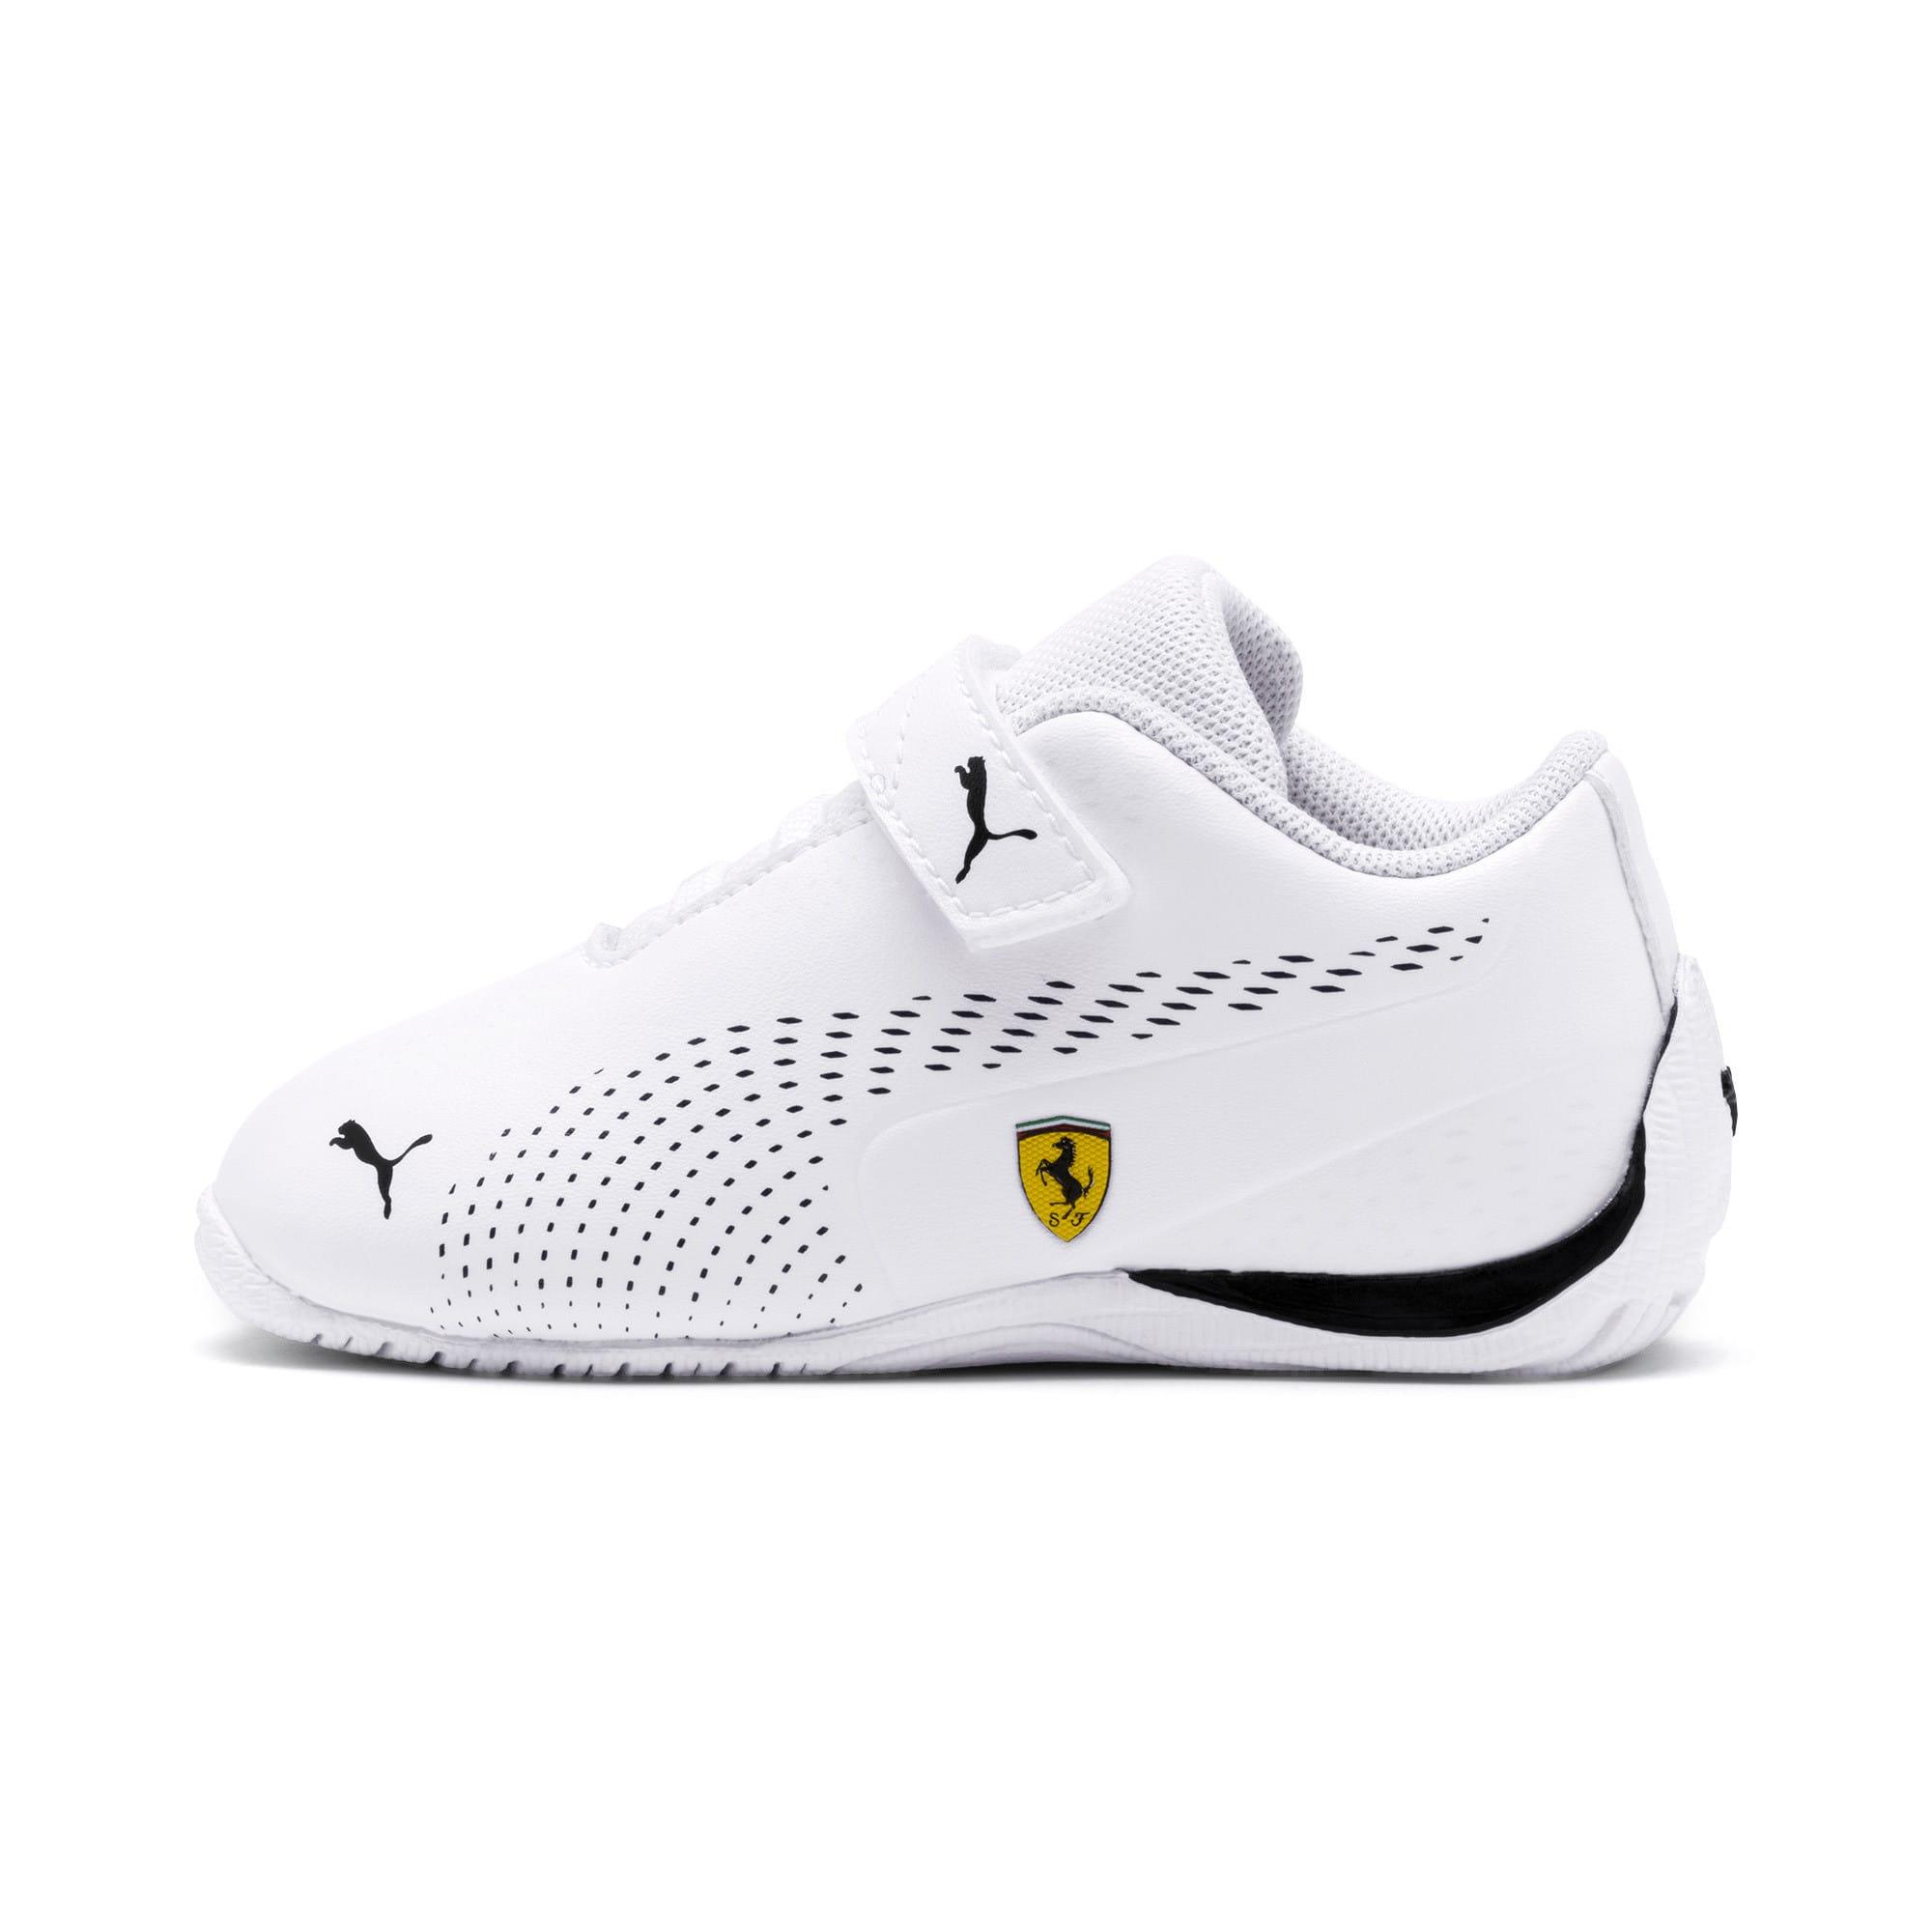 Thumbnail 1 of Scuderia Ferrari Drift Cat 5 Ultra II Toddler Shoes, Puma White-Puma Black, medium